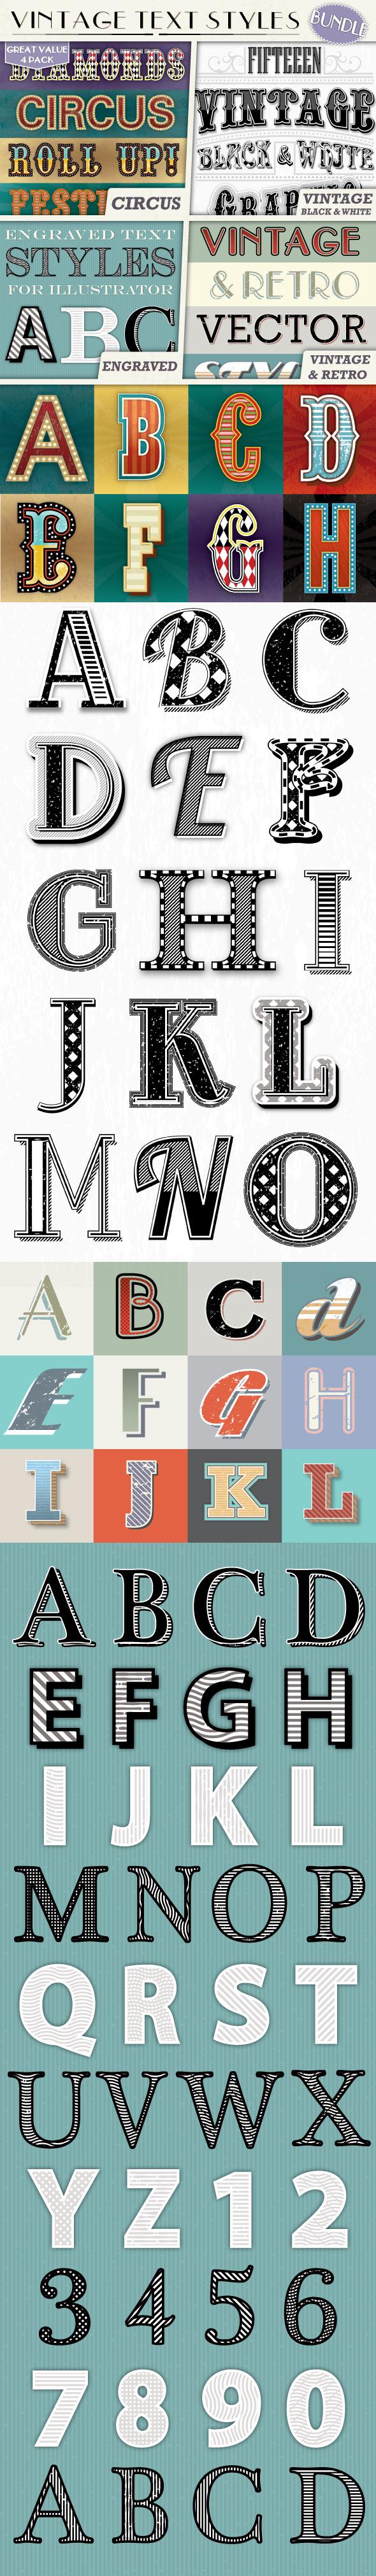 Vintage Text Styles Bundle - Styles Illustrator